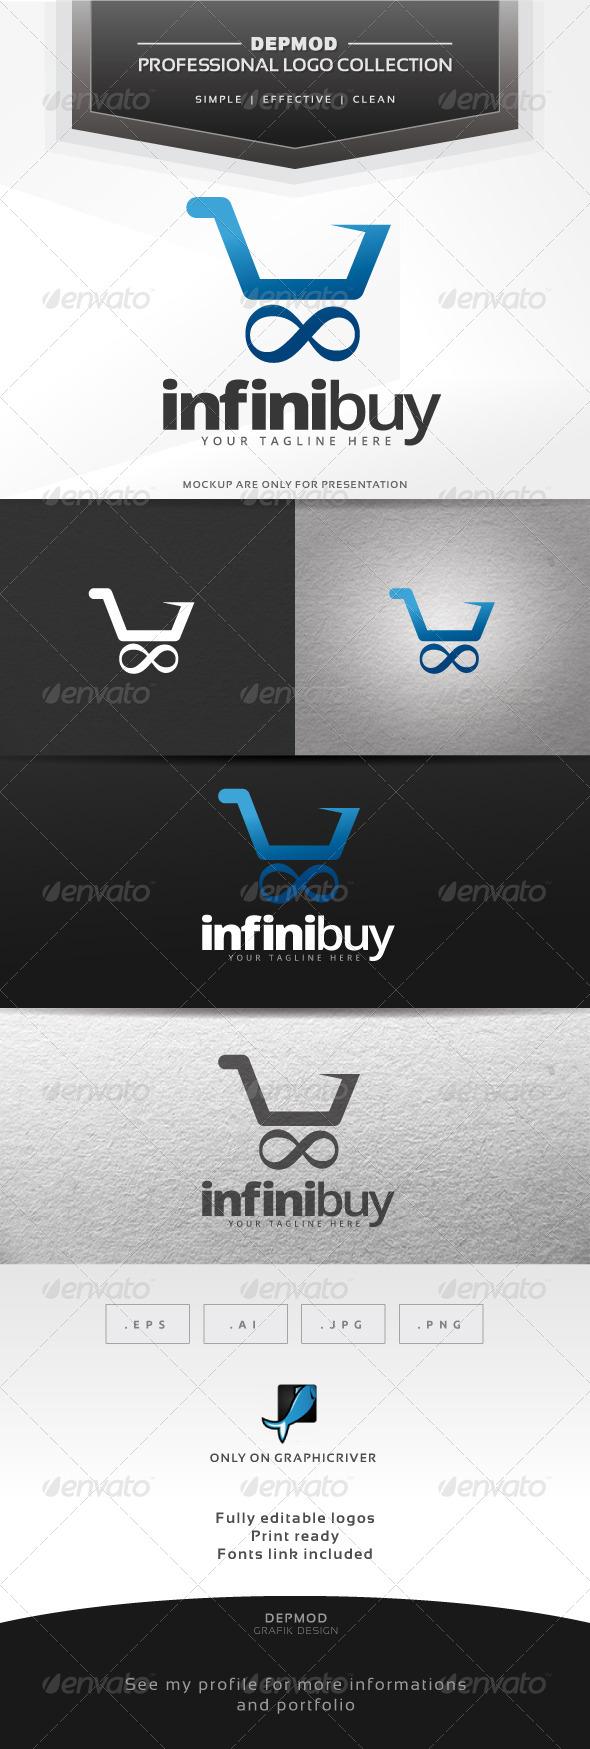 GraphicRiver Infini Buy Logo 7235969